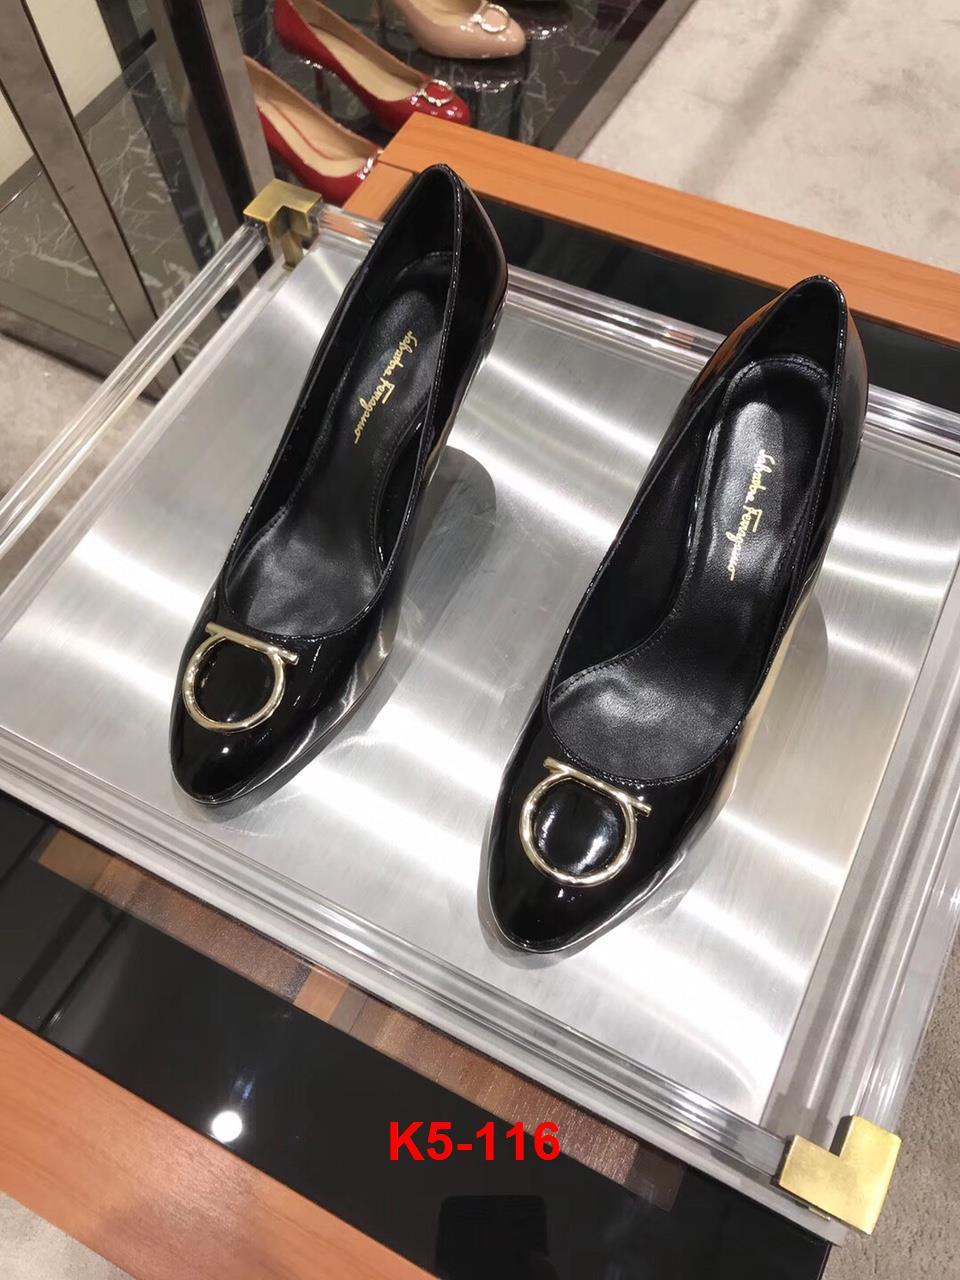 K5-116 Salvatore Ferragamo giày cao 7cm siêu cấp